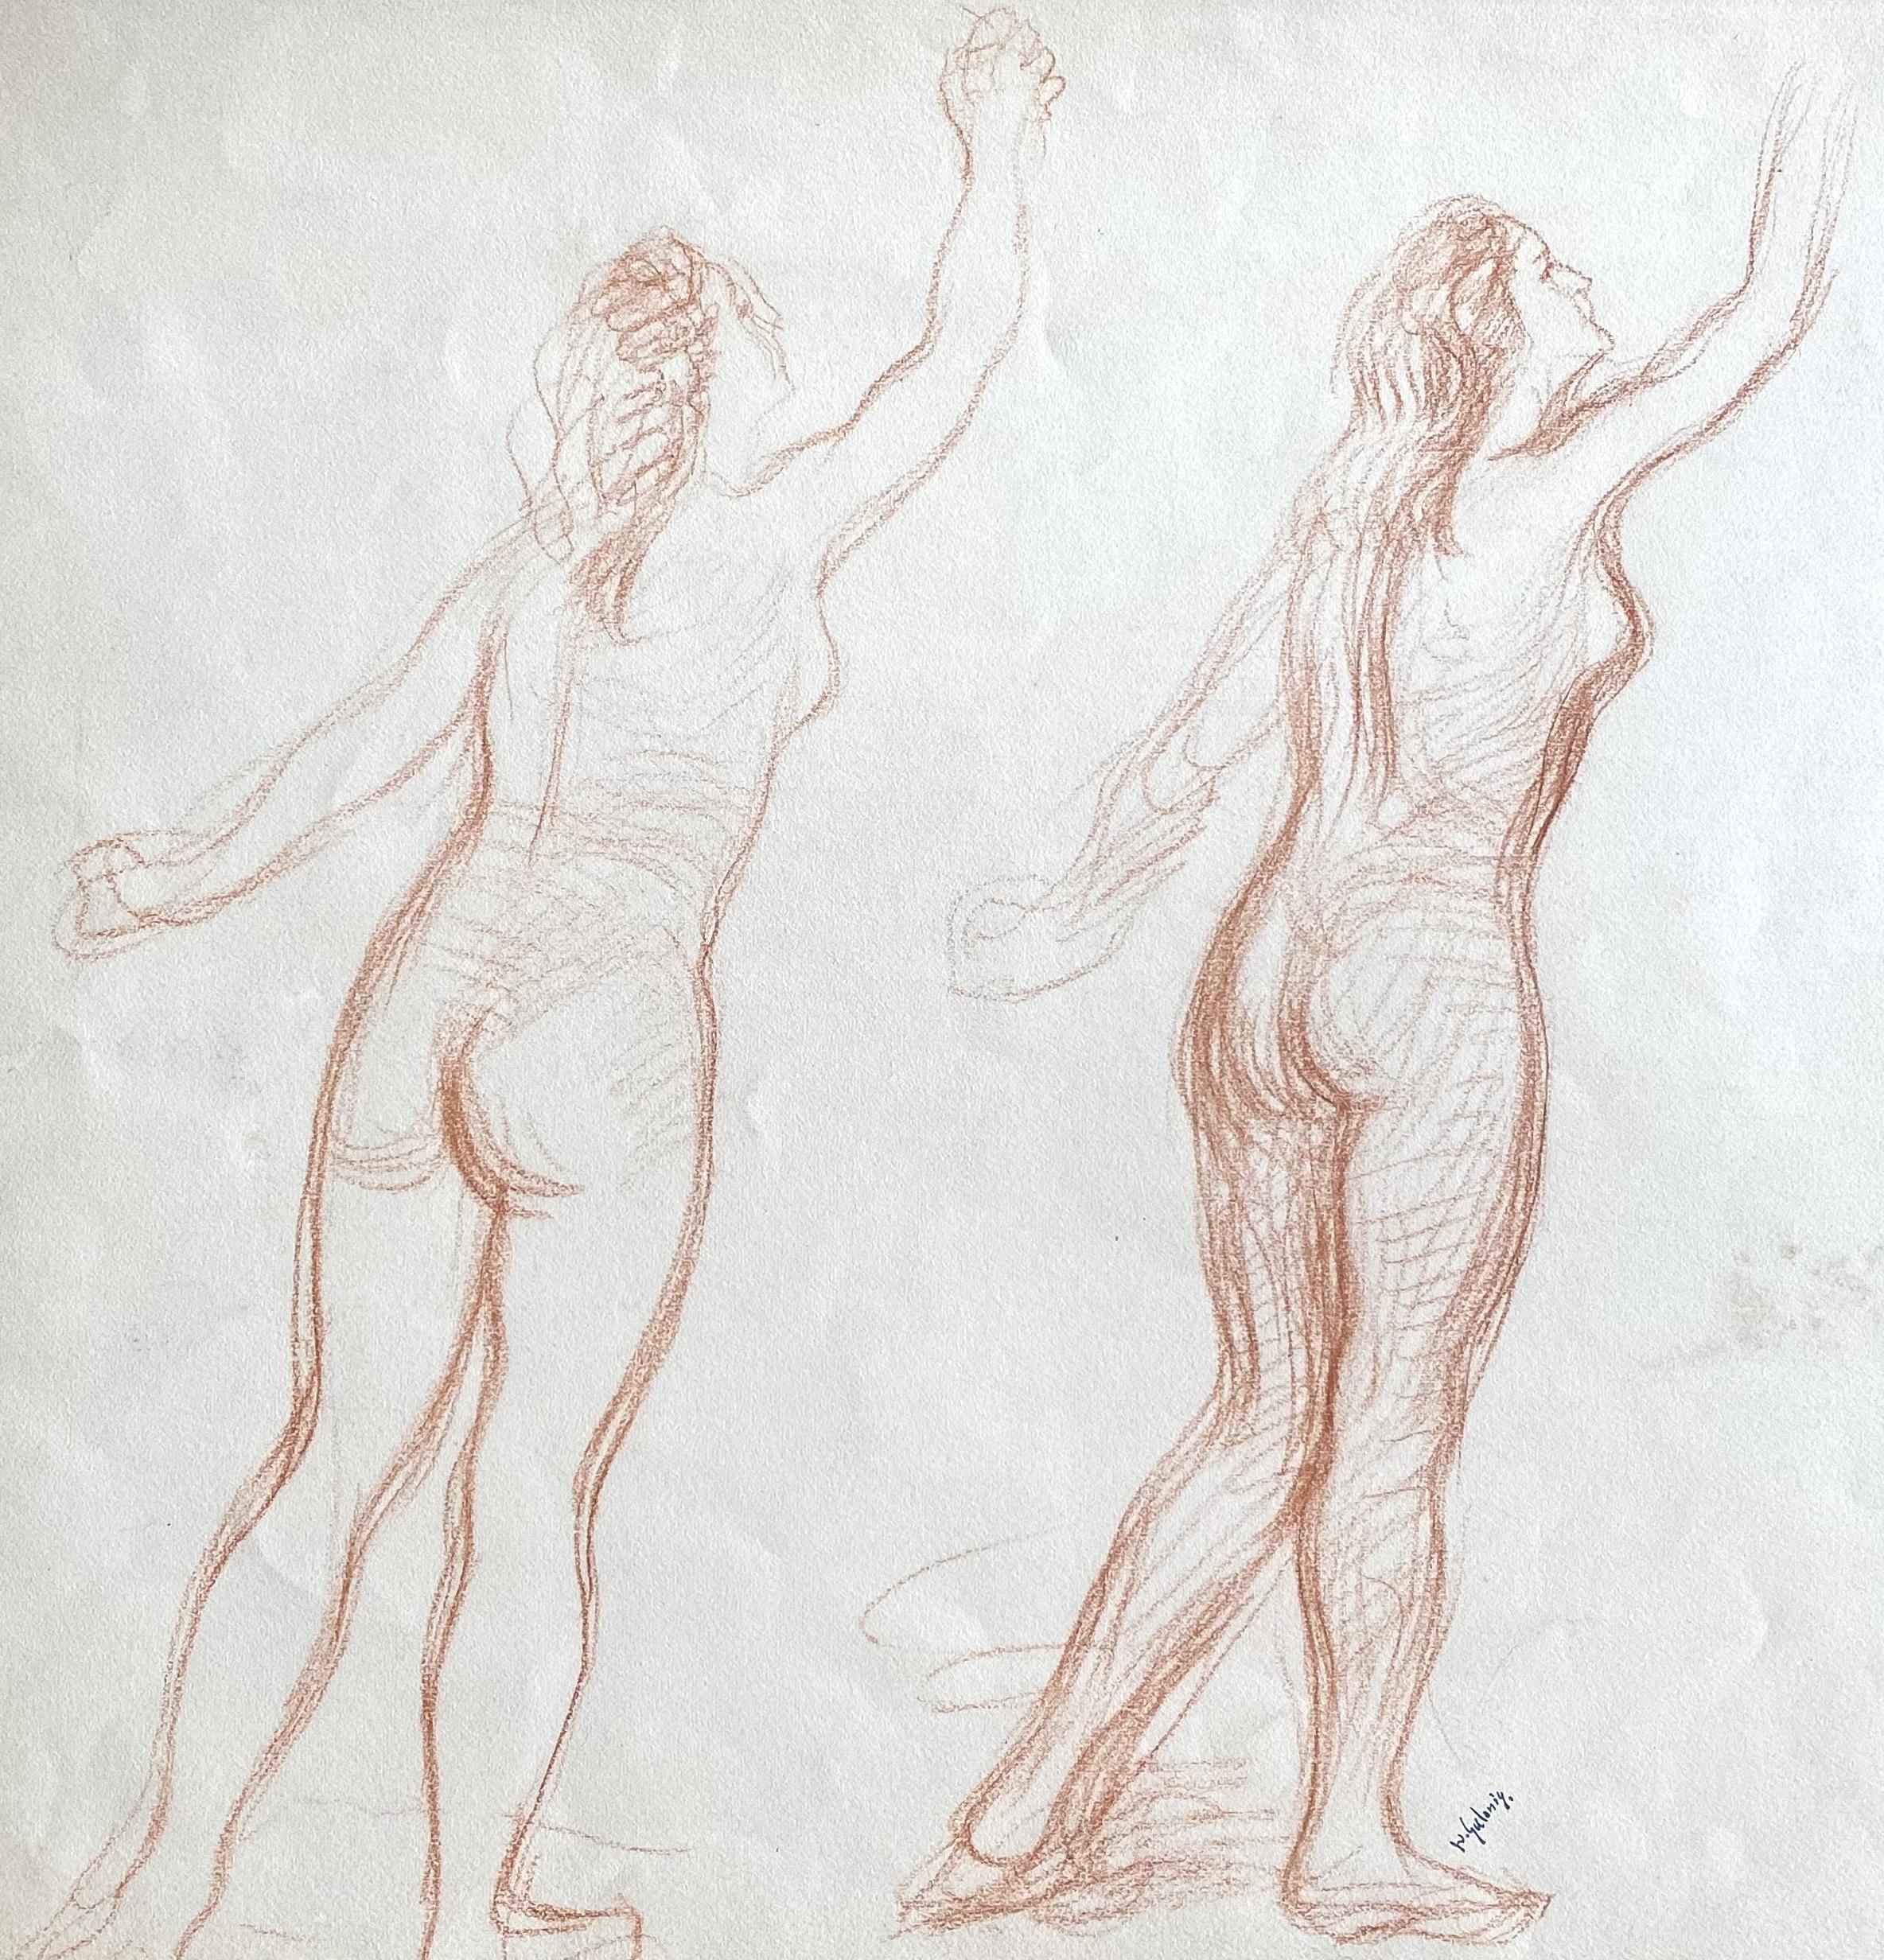 Dimitrios Galanis (Greek, 1880-1966) (AR), Two nude females, sanguine on paper, 43 x 41 cm.